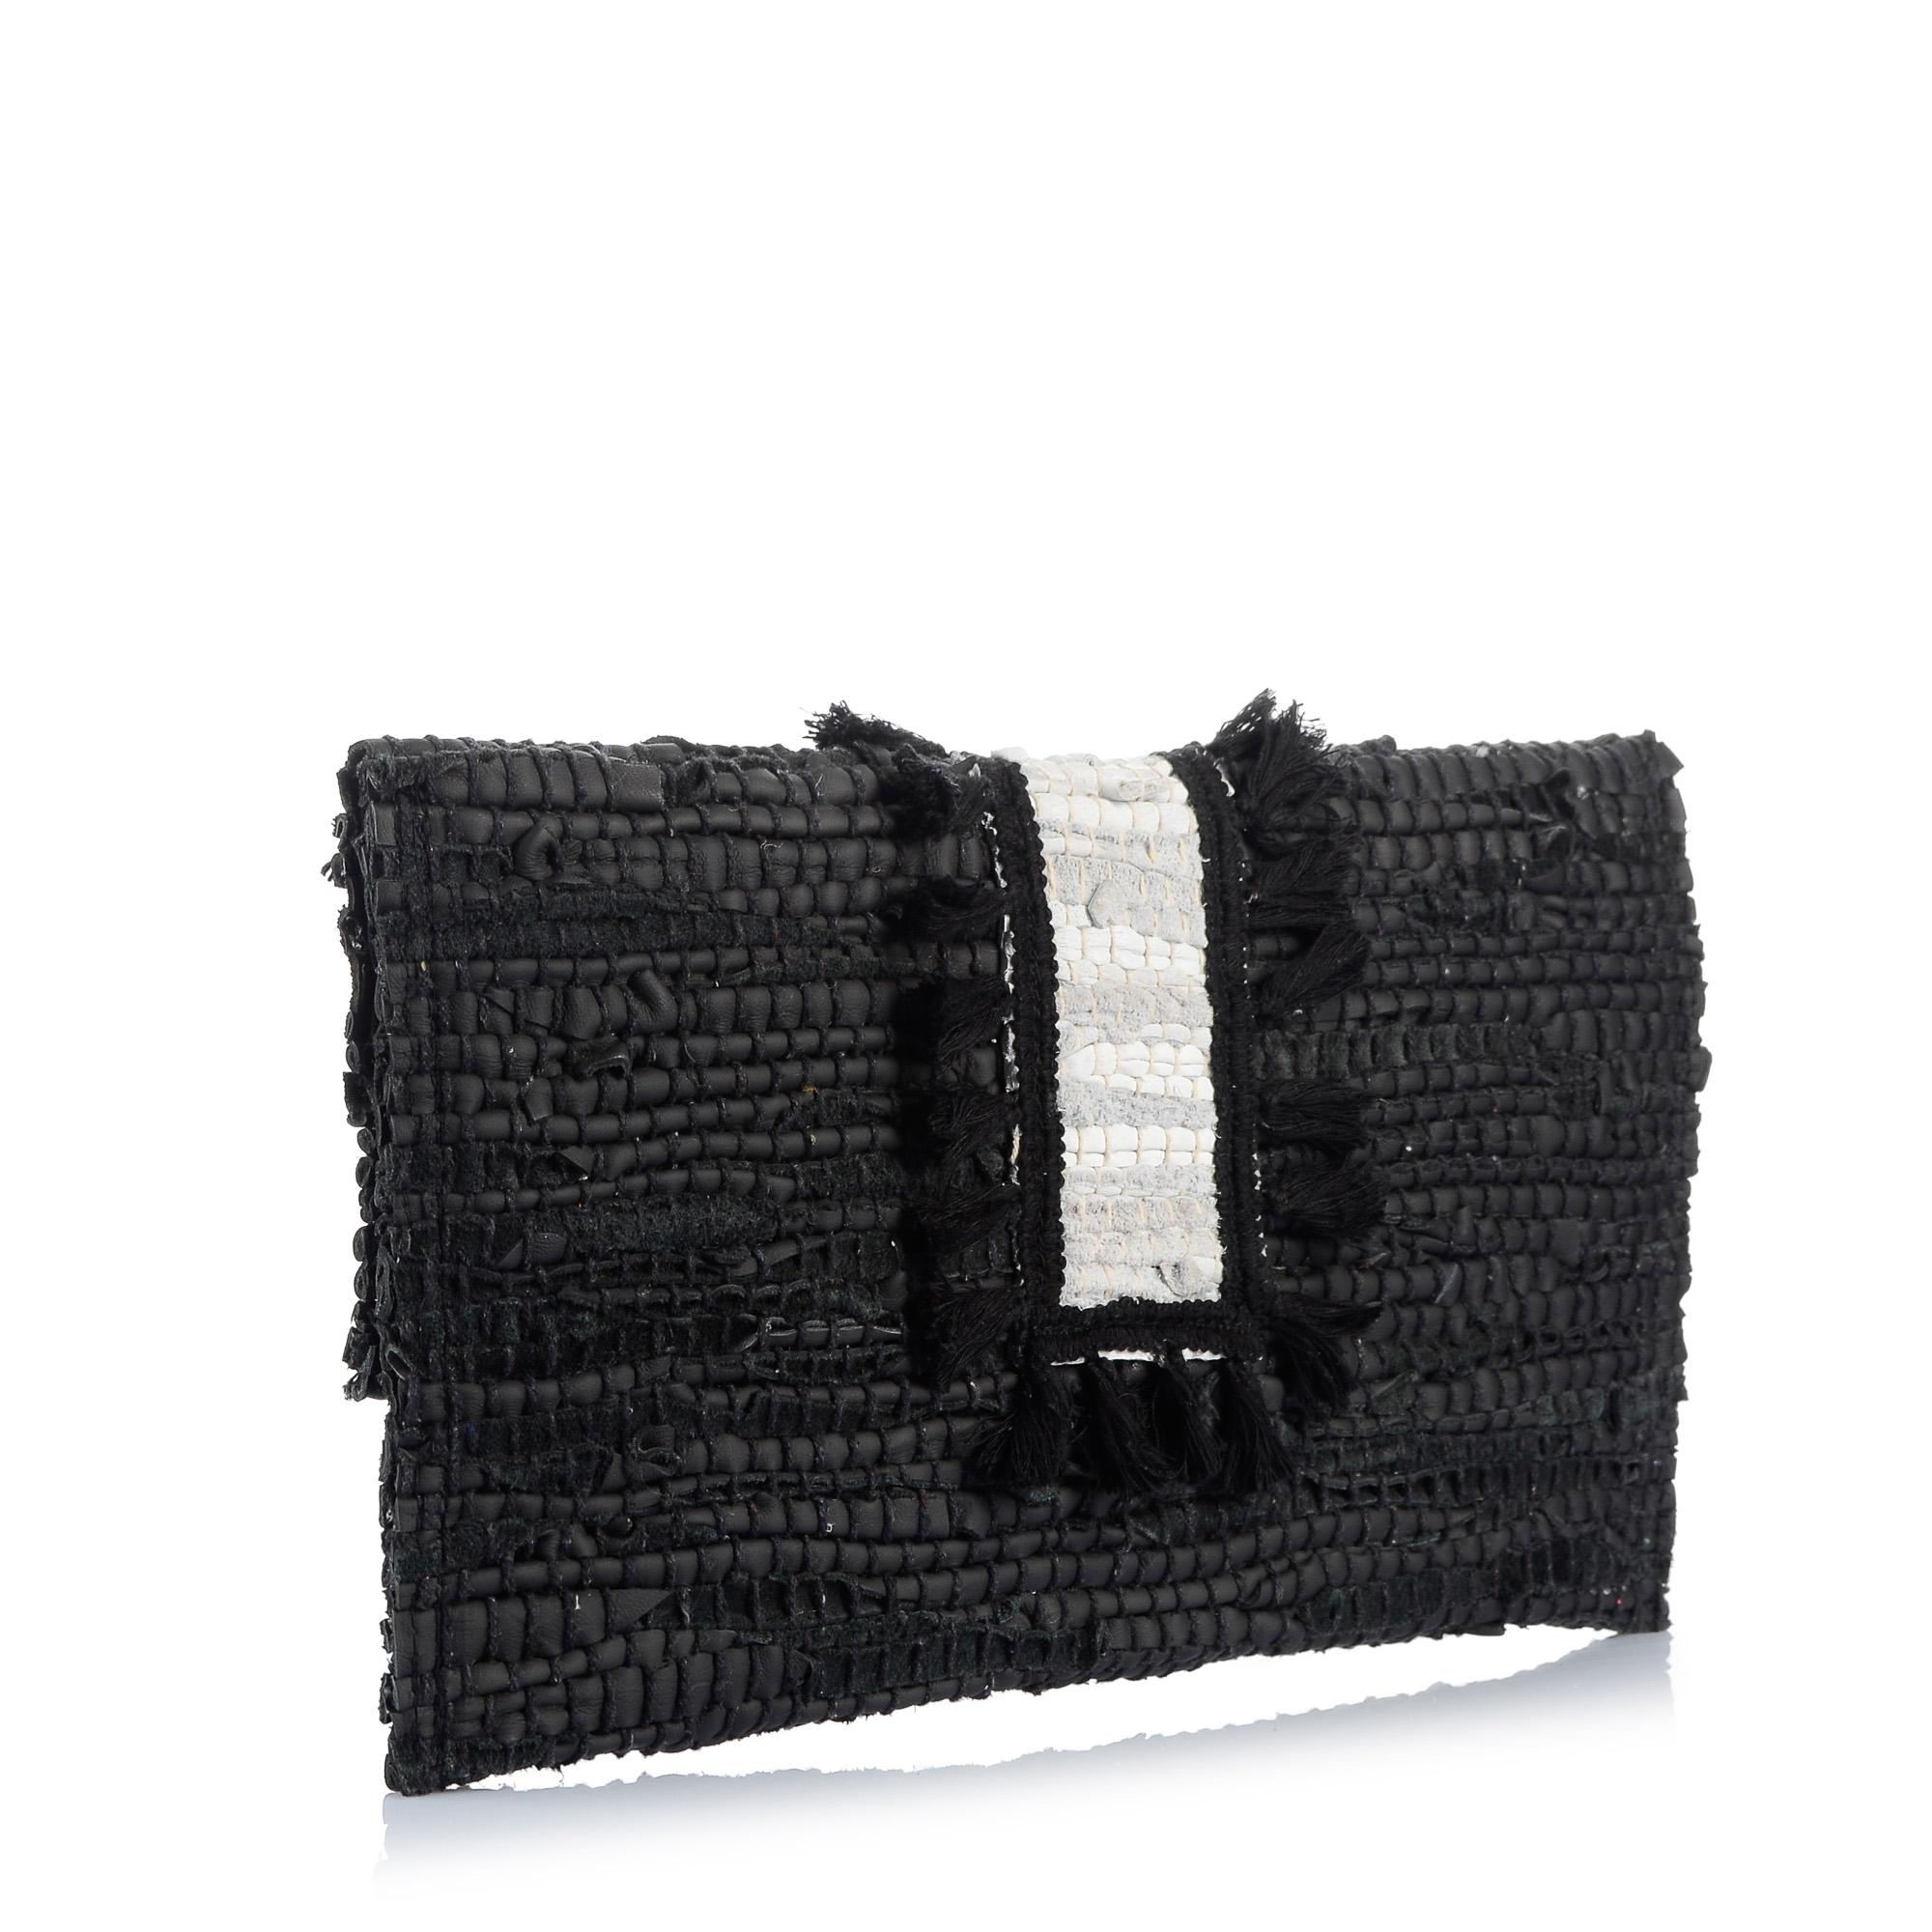 f4fe5a02f3 Chic Clutch – GioRafael – Handmade Handbags – Luxurious Kourelou ...